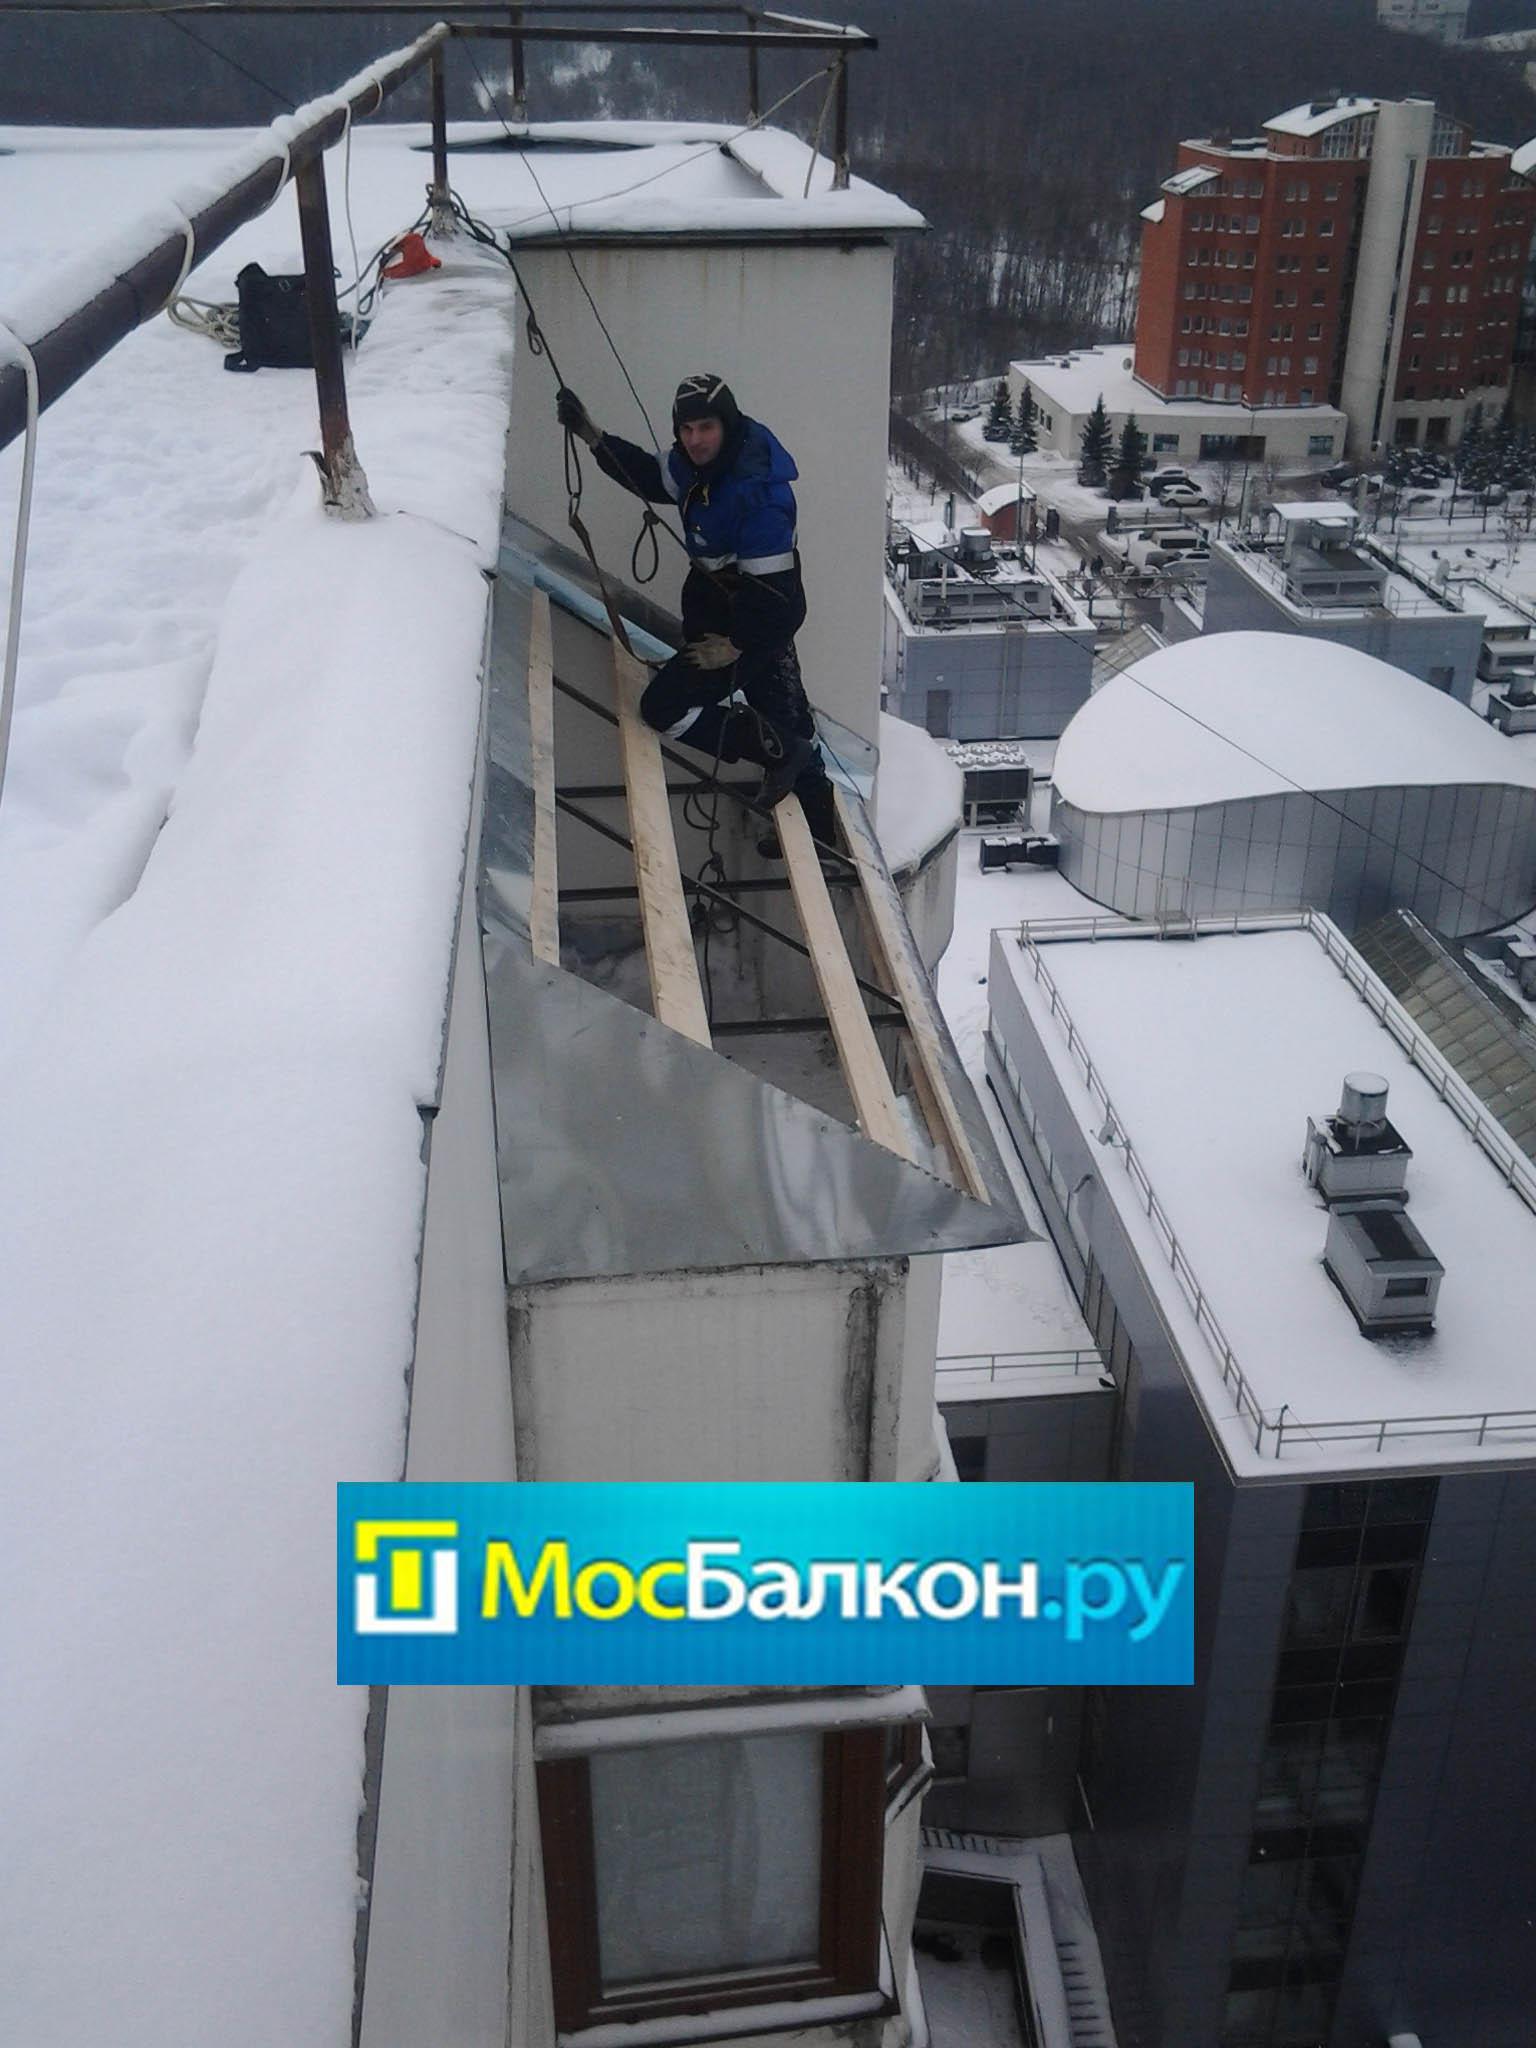 Разрешение на установку крыши на балконе.